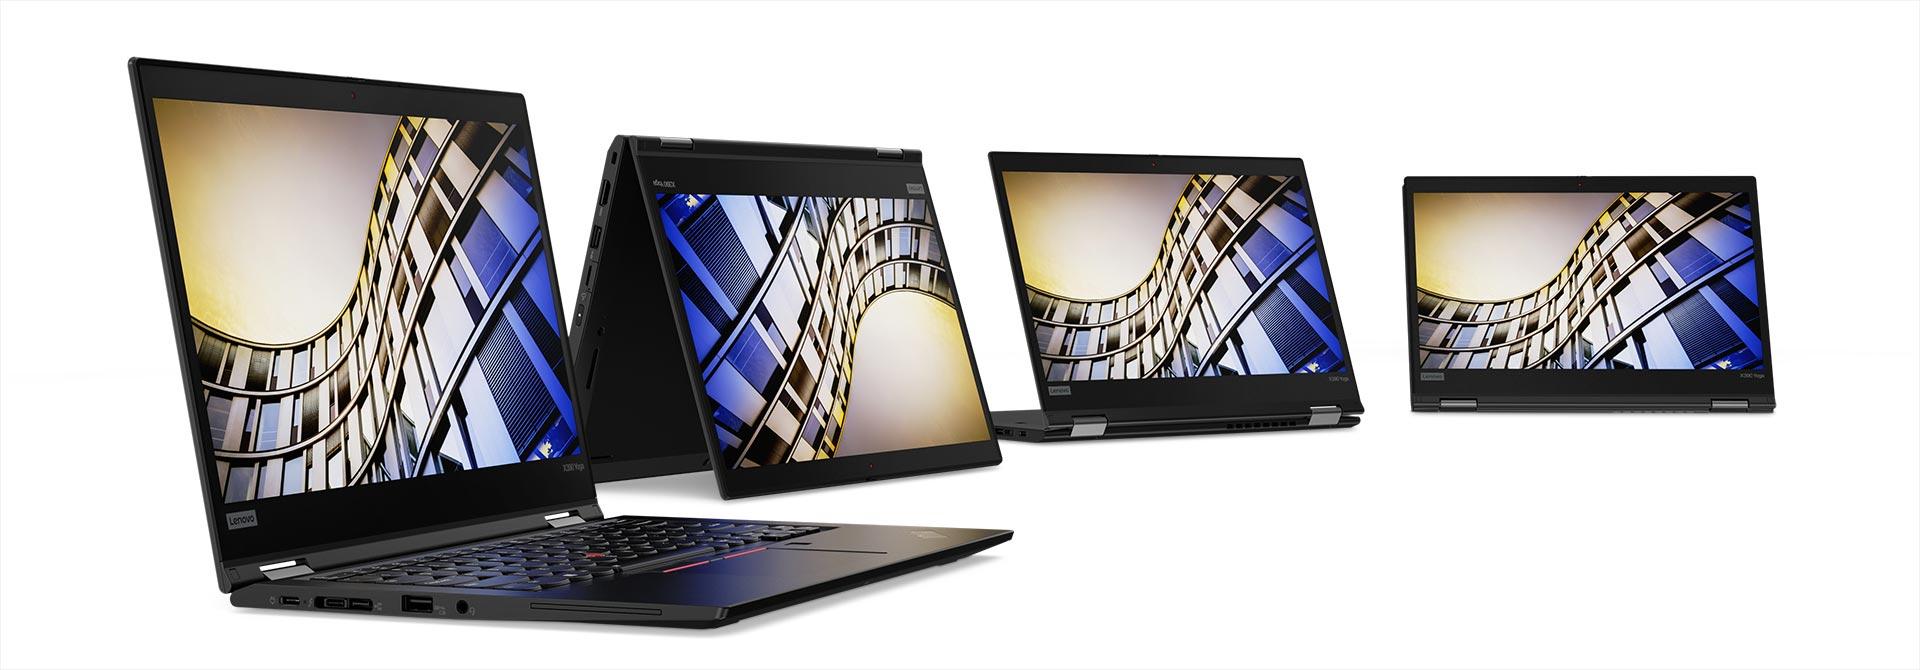 Lenovo ThinkPad T Series 2019